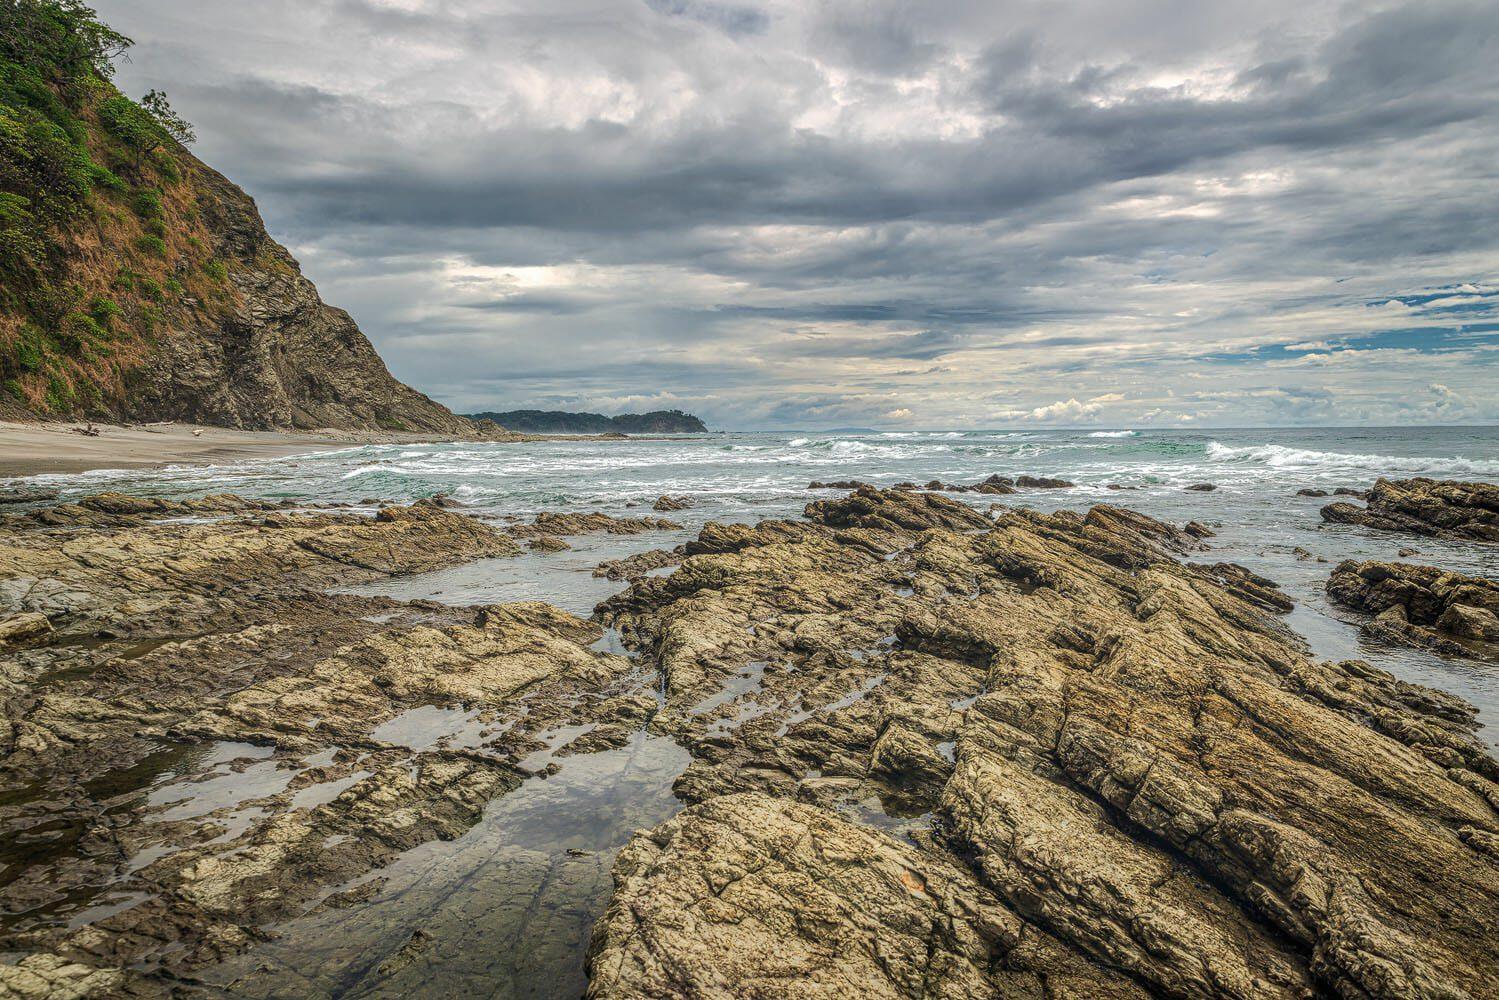 Beautiful cloudy sky on the rocky peninsula of playa bonita - Costa Rica